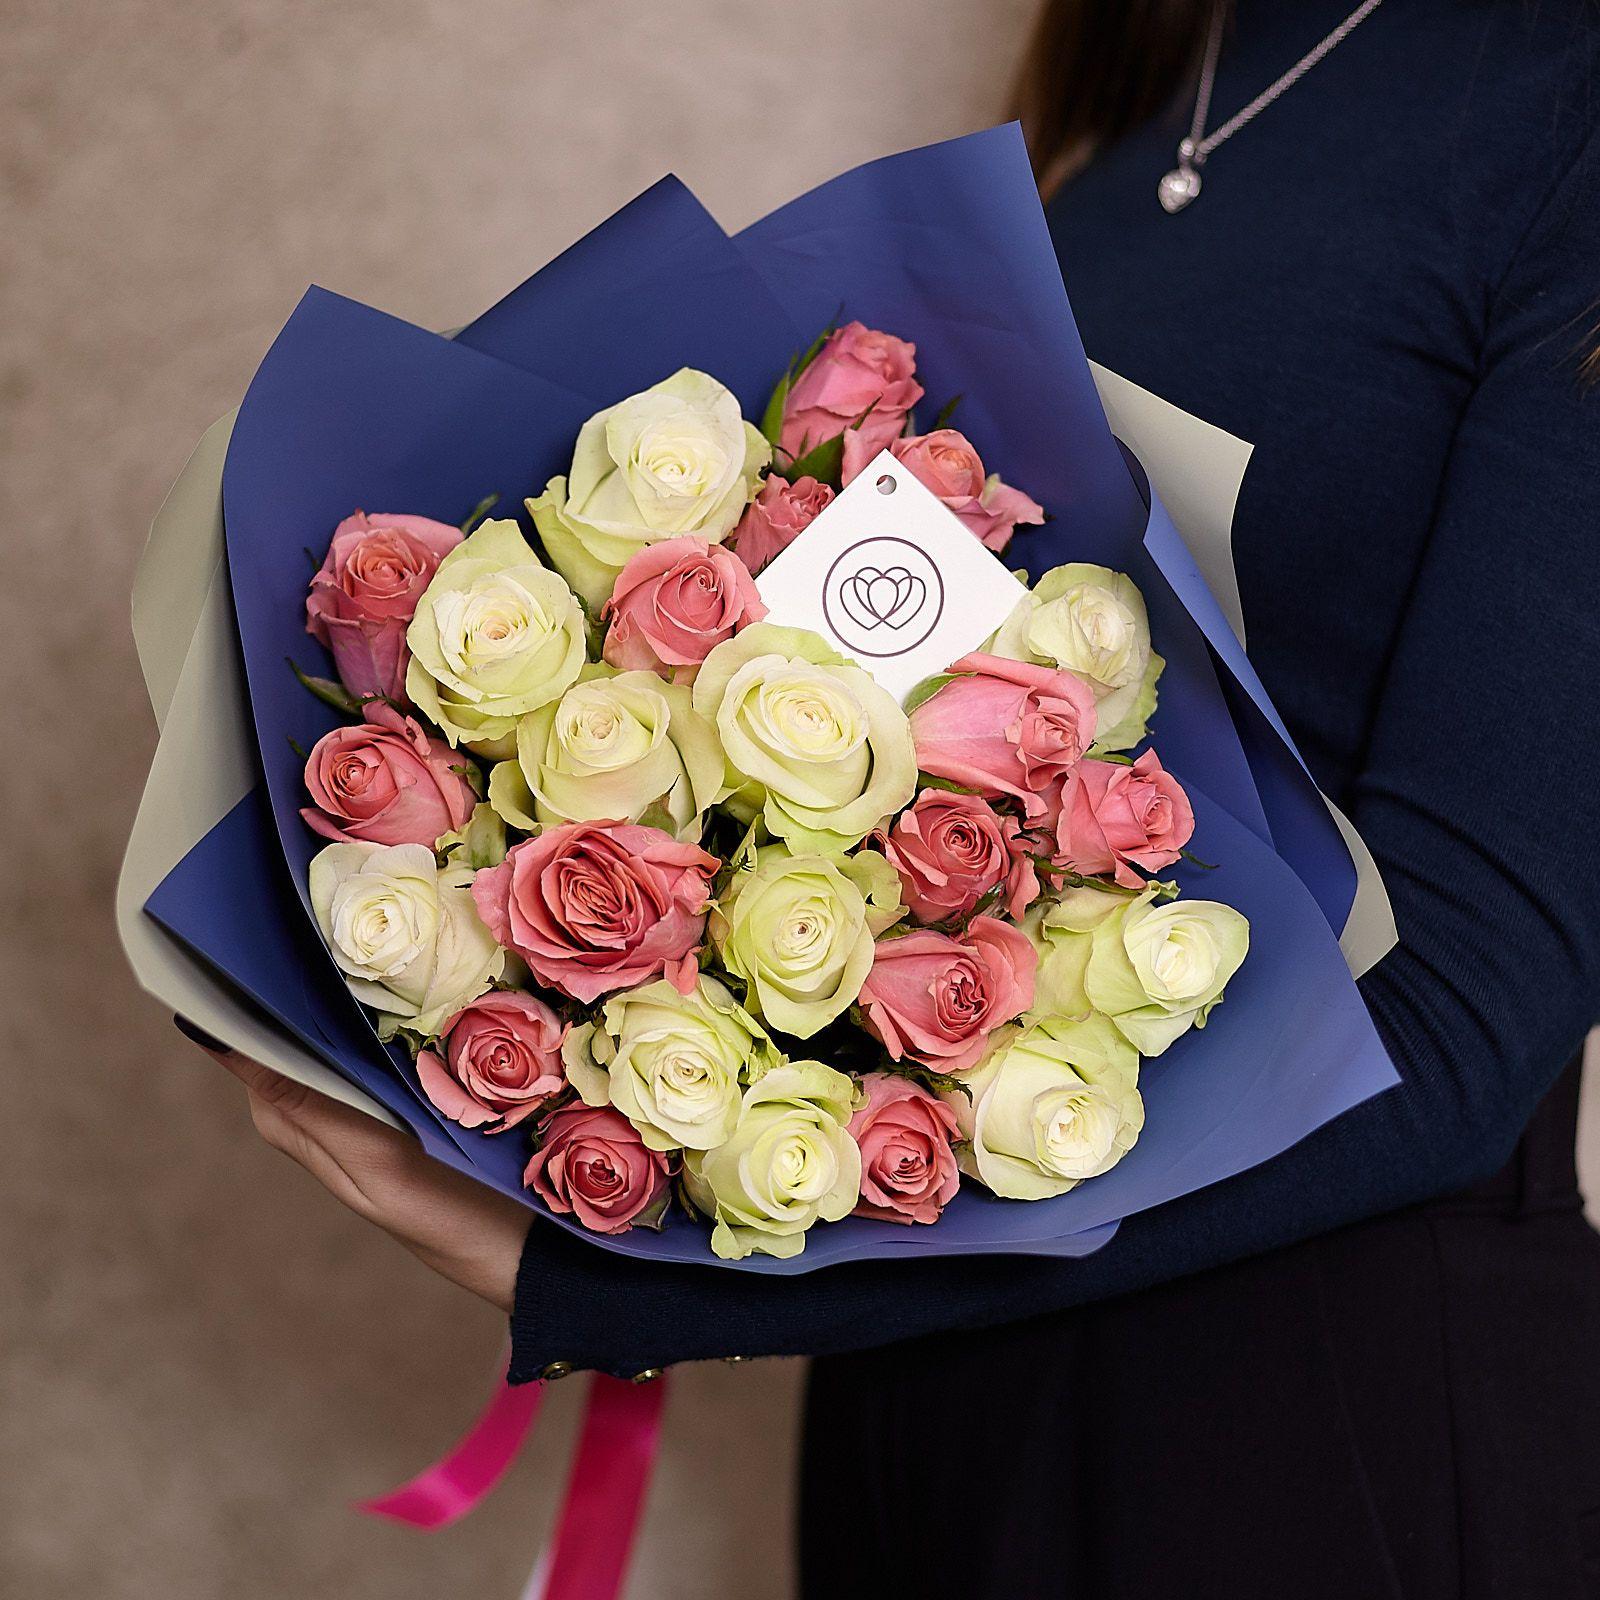 25 белых и розовых роз 40 см Premium фото